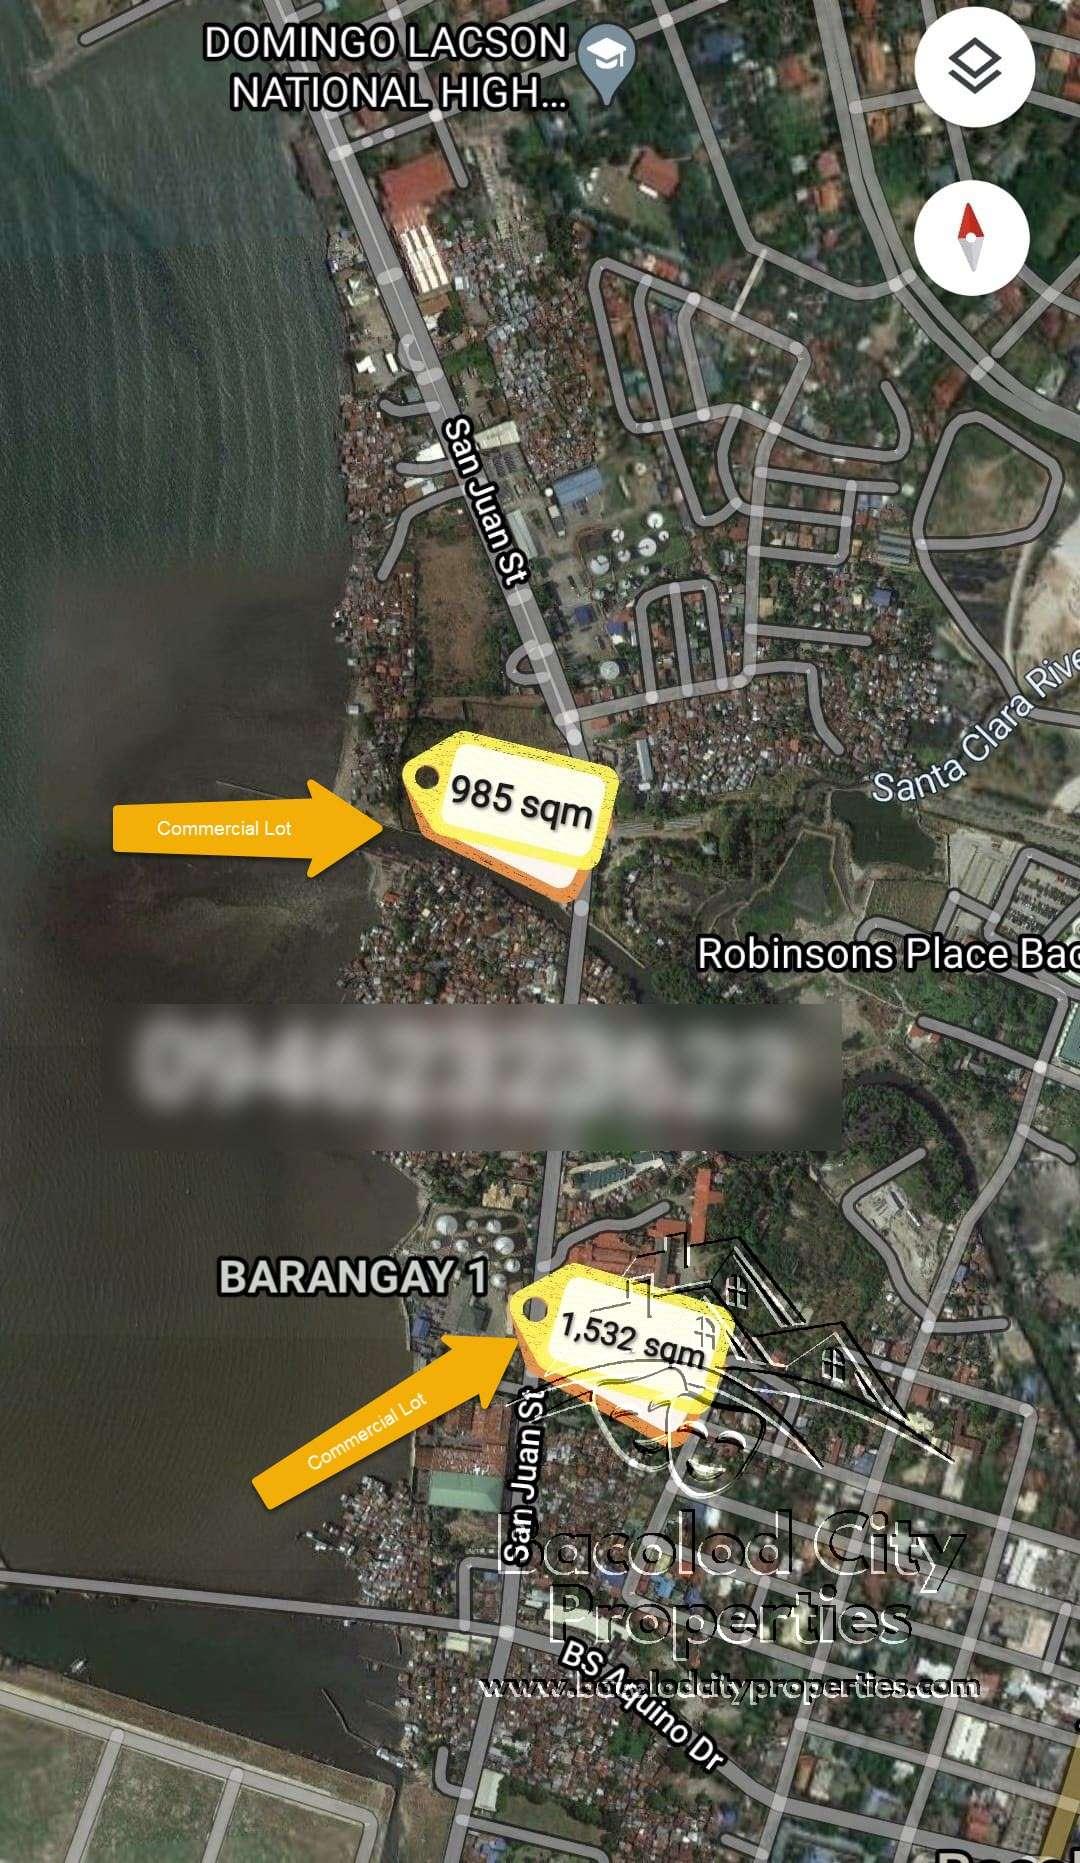 Commercial Lot San Juan St Bacolod